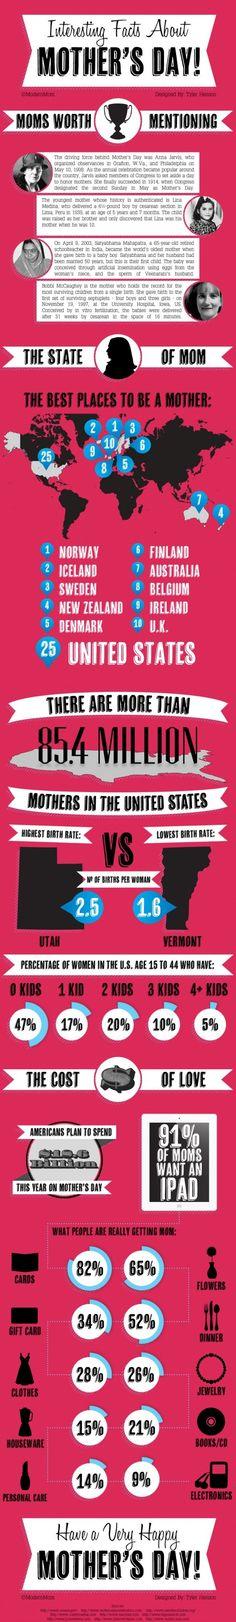 Idée cadeau fête des mères original - HAPPY MOTHER'S DAY! Some surprising totals!  Mother's Day in France toda